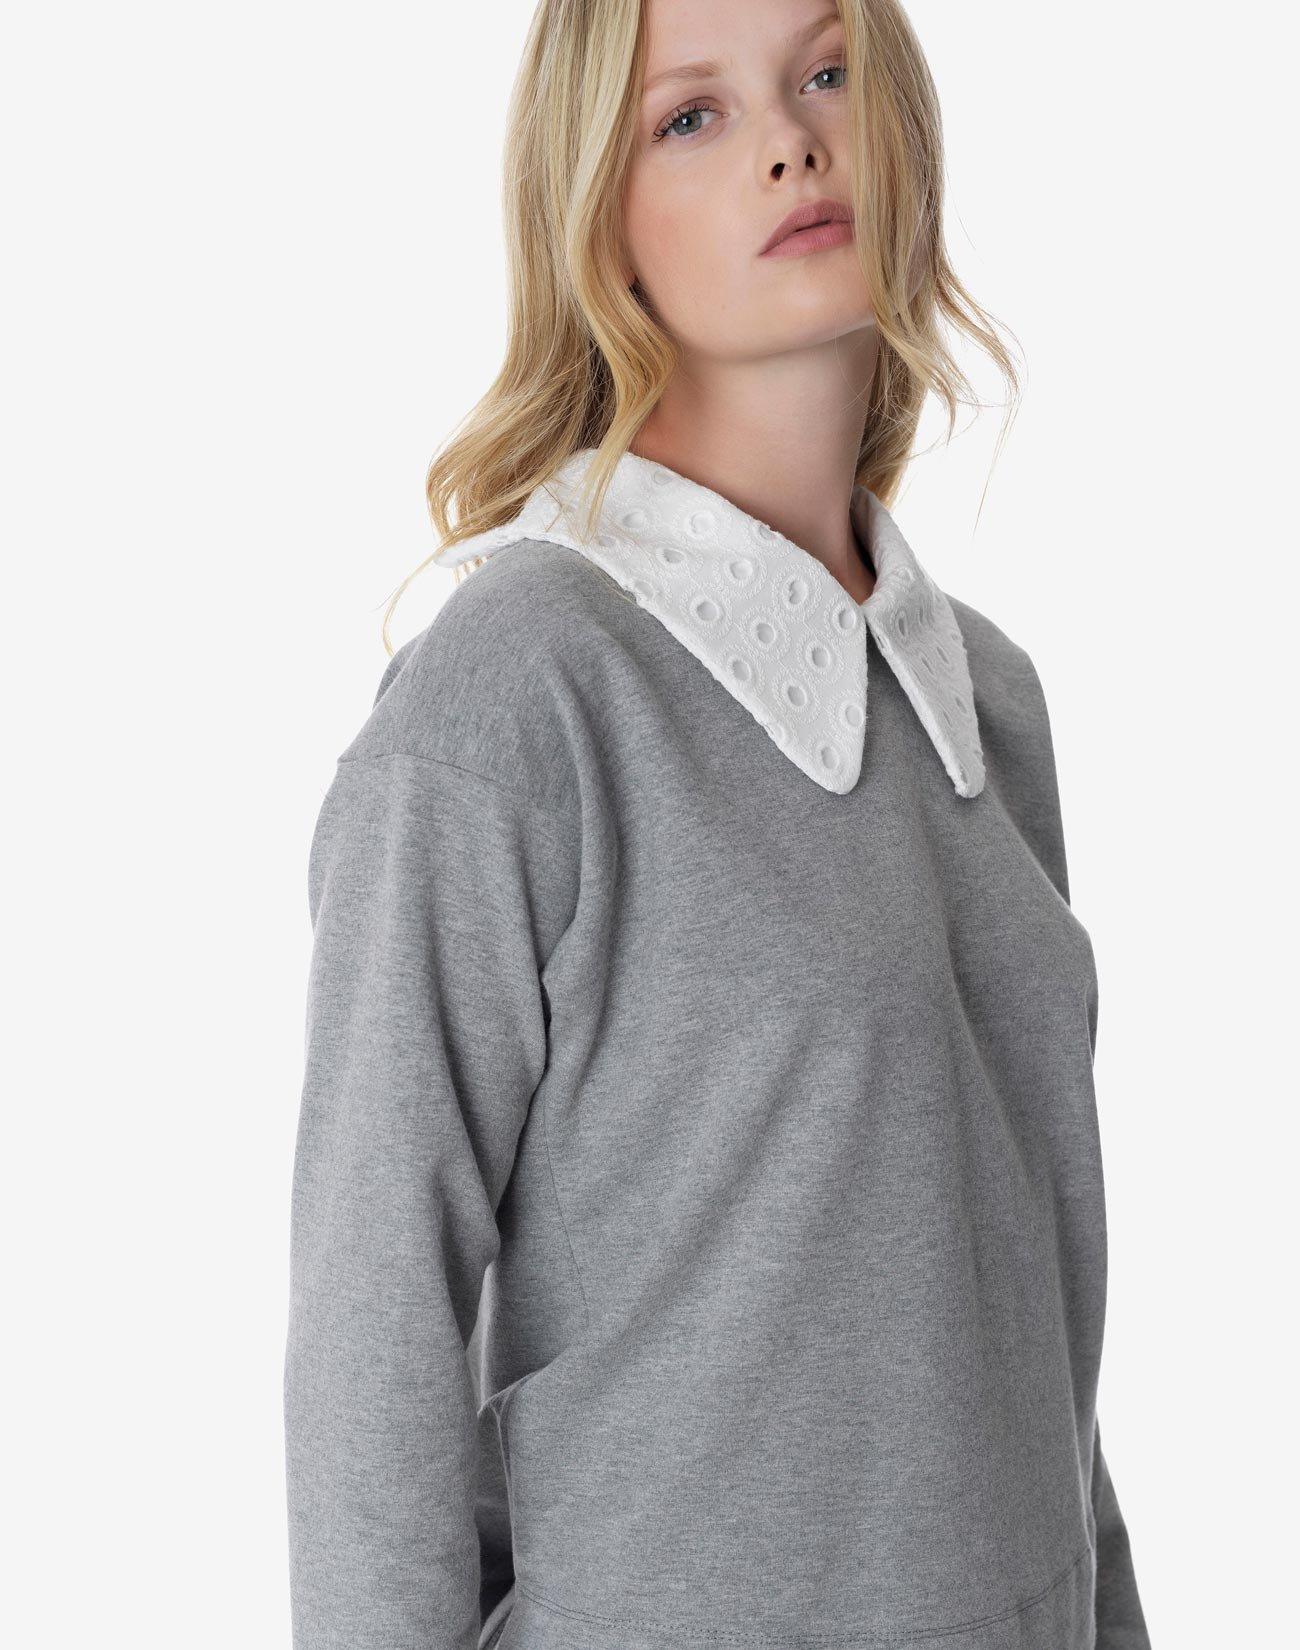 Sweatshirt with collar